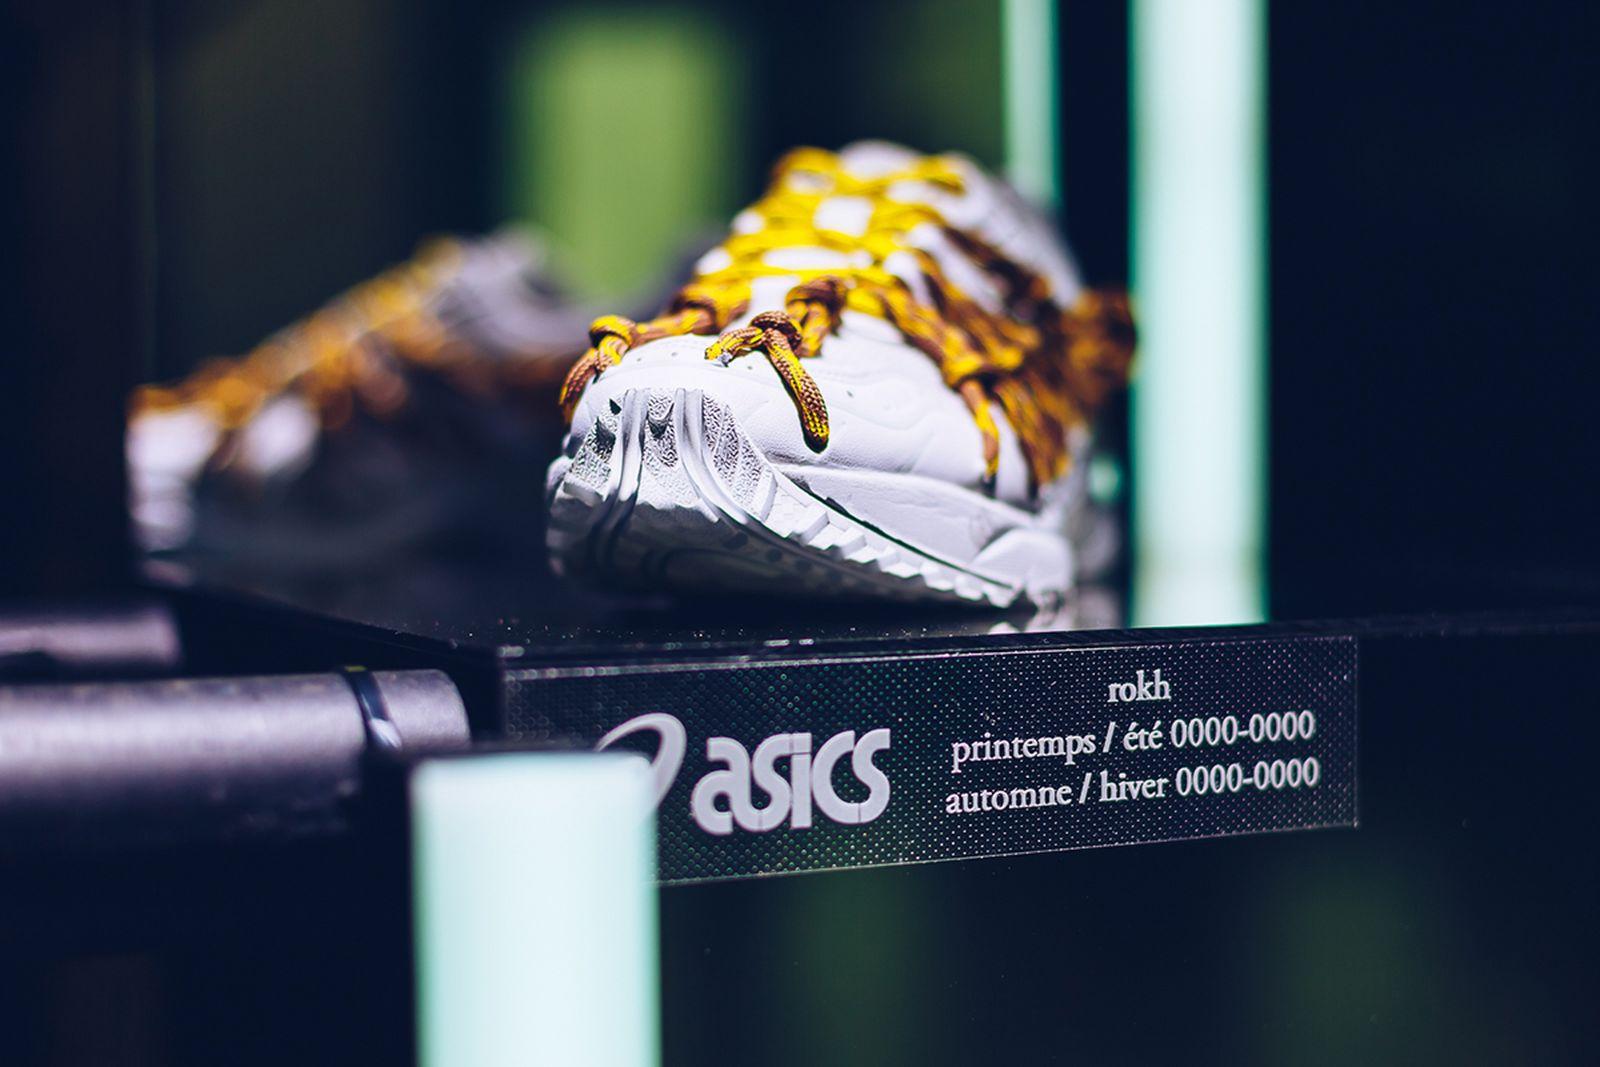 ASICS Introduces Partnership With rokh at Paris Fashion Week